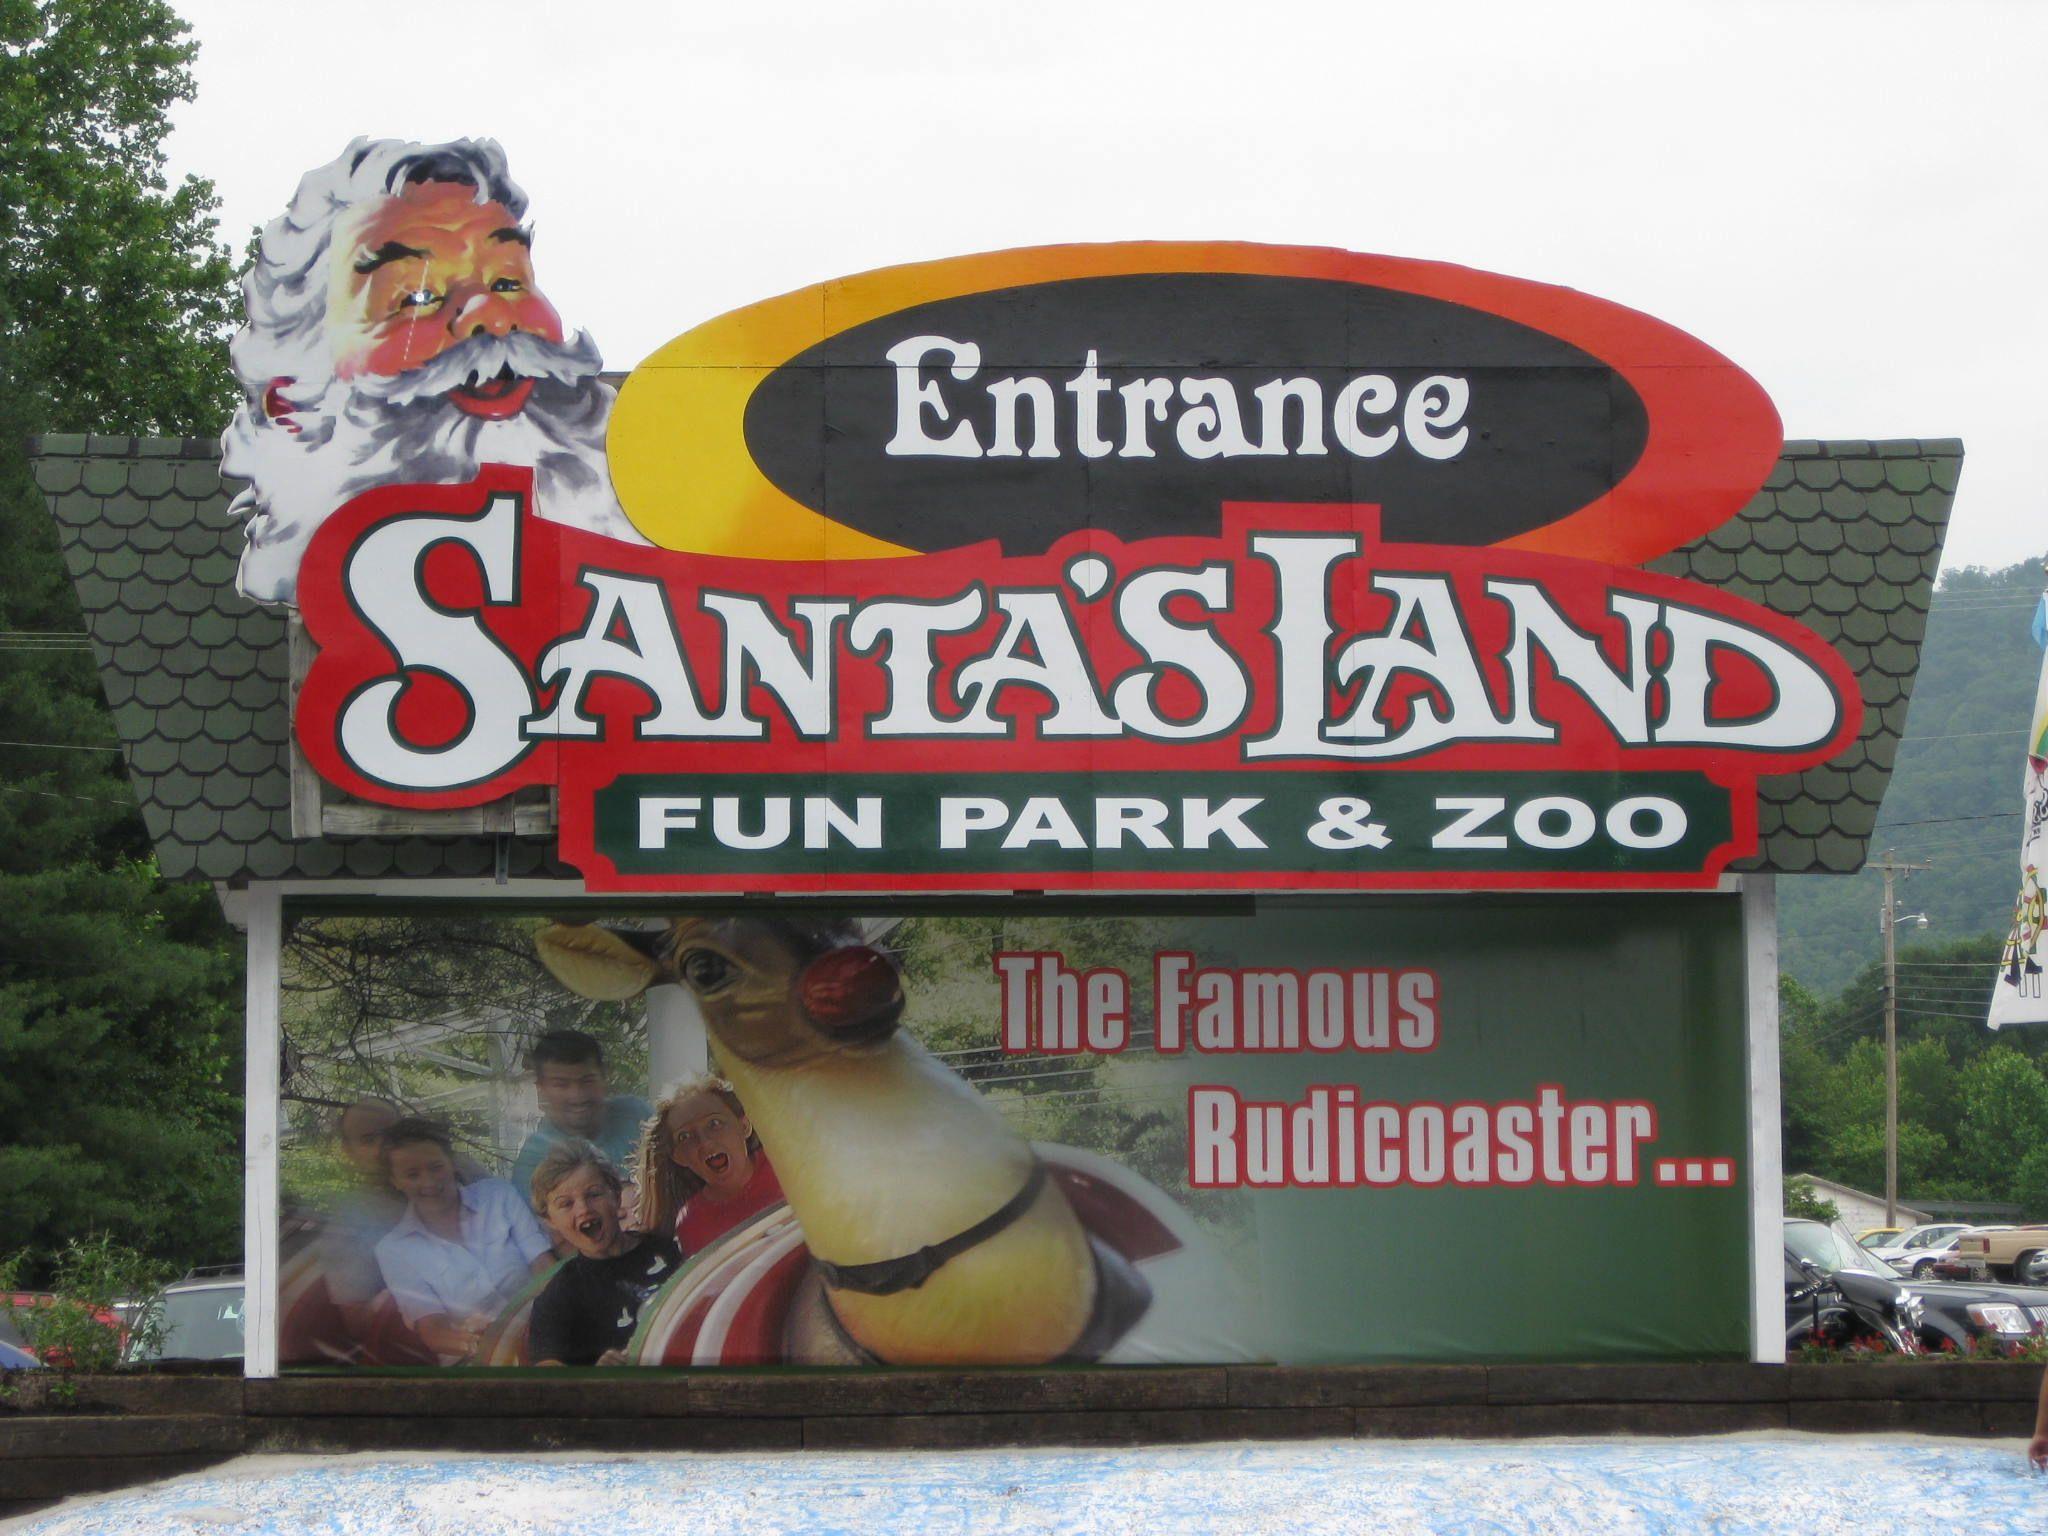 Santa's Land Cherokee, NC (Loved it! Great retro feel and